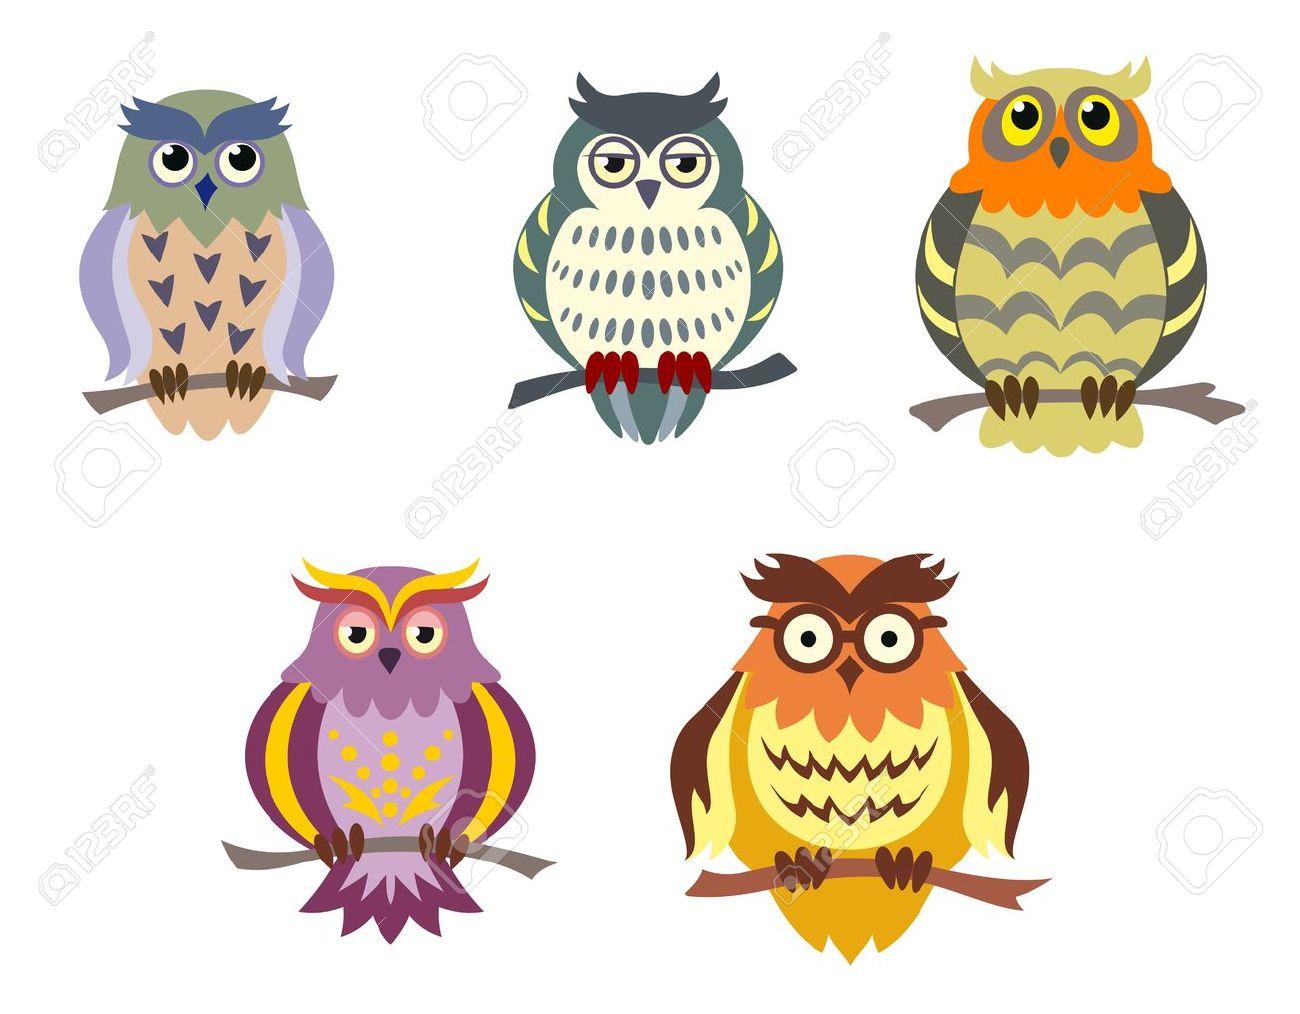 Color cartoon owls set in doodle style for funny design color cartoon owls set in doodle style for funny design 14160542 voltagebd Images